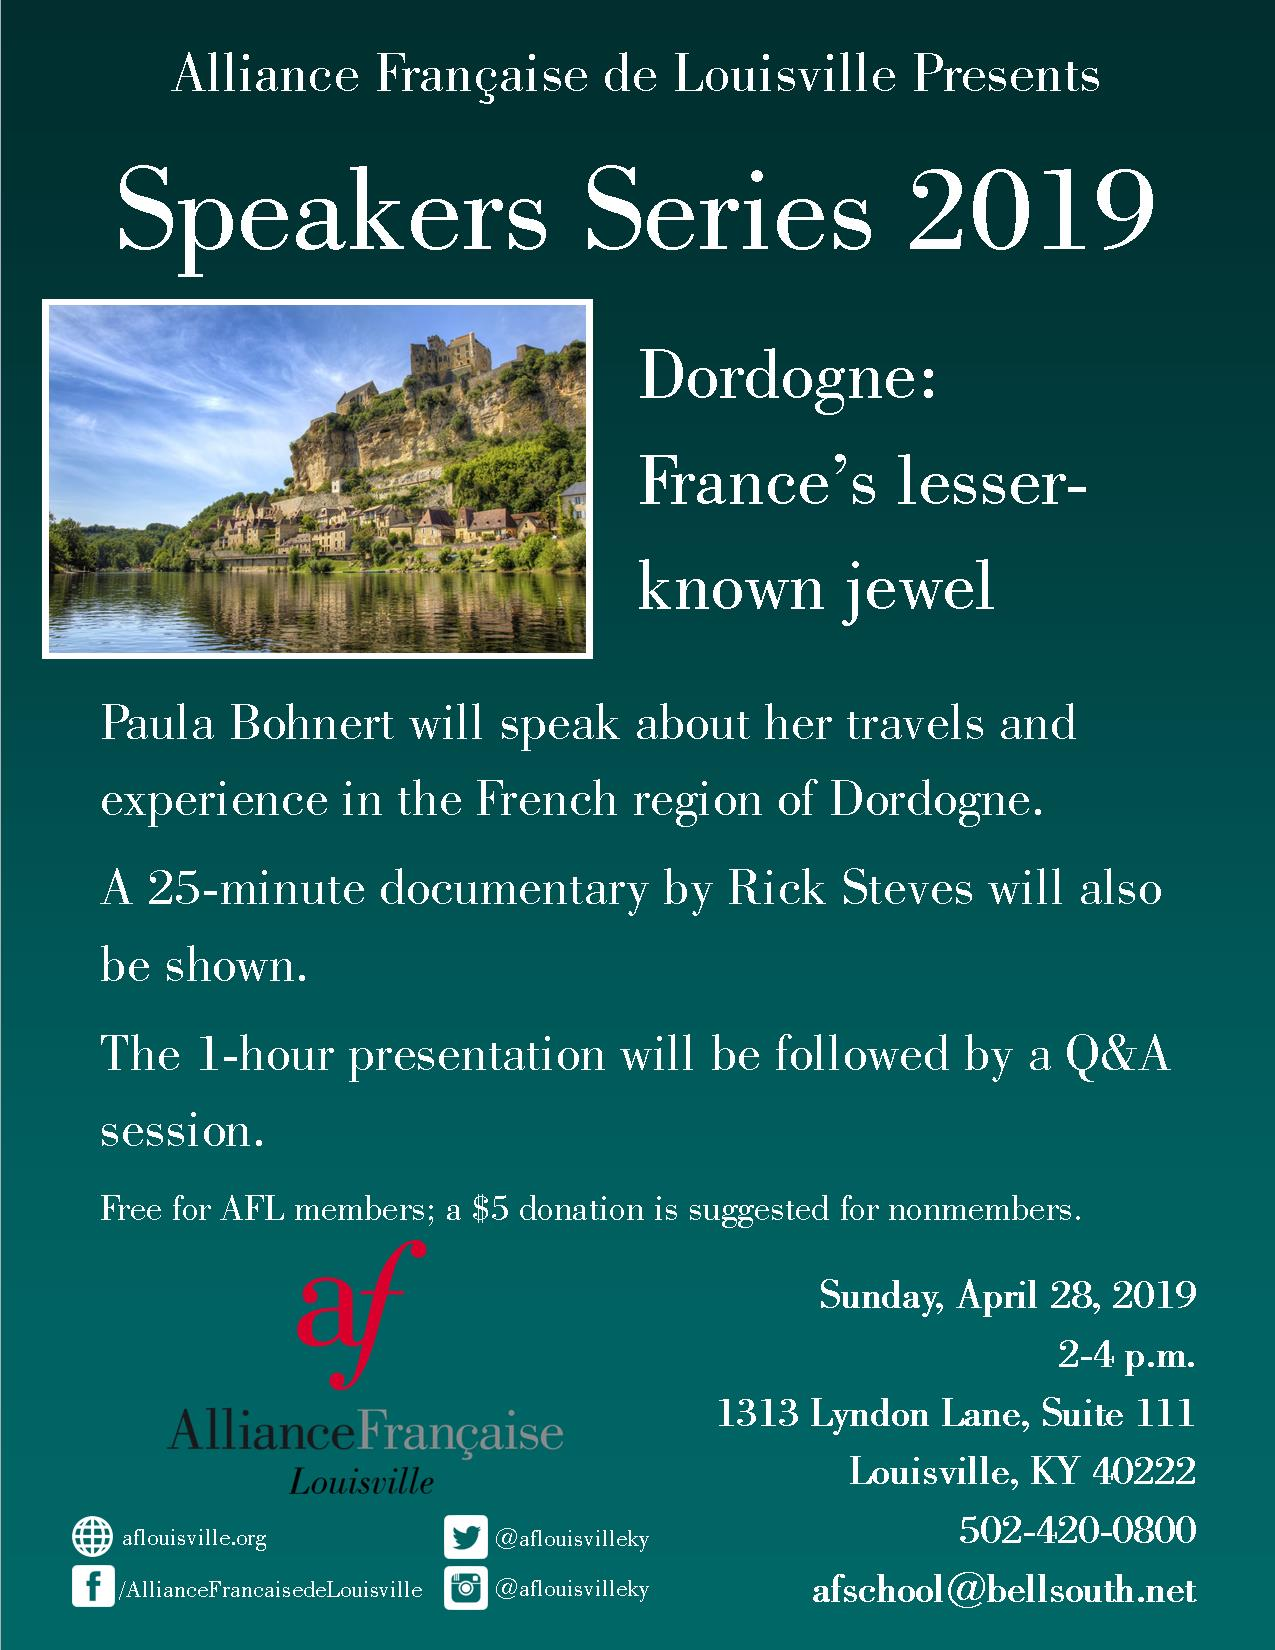 Dordogne flyer